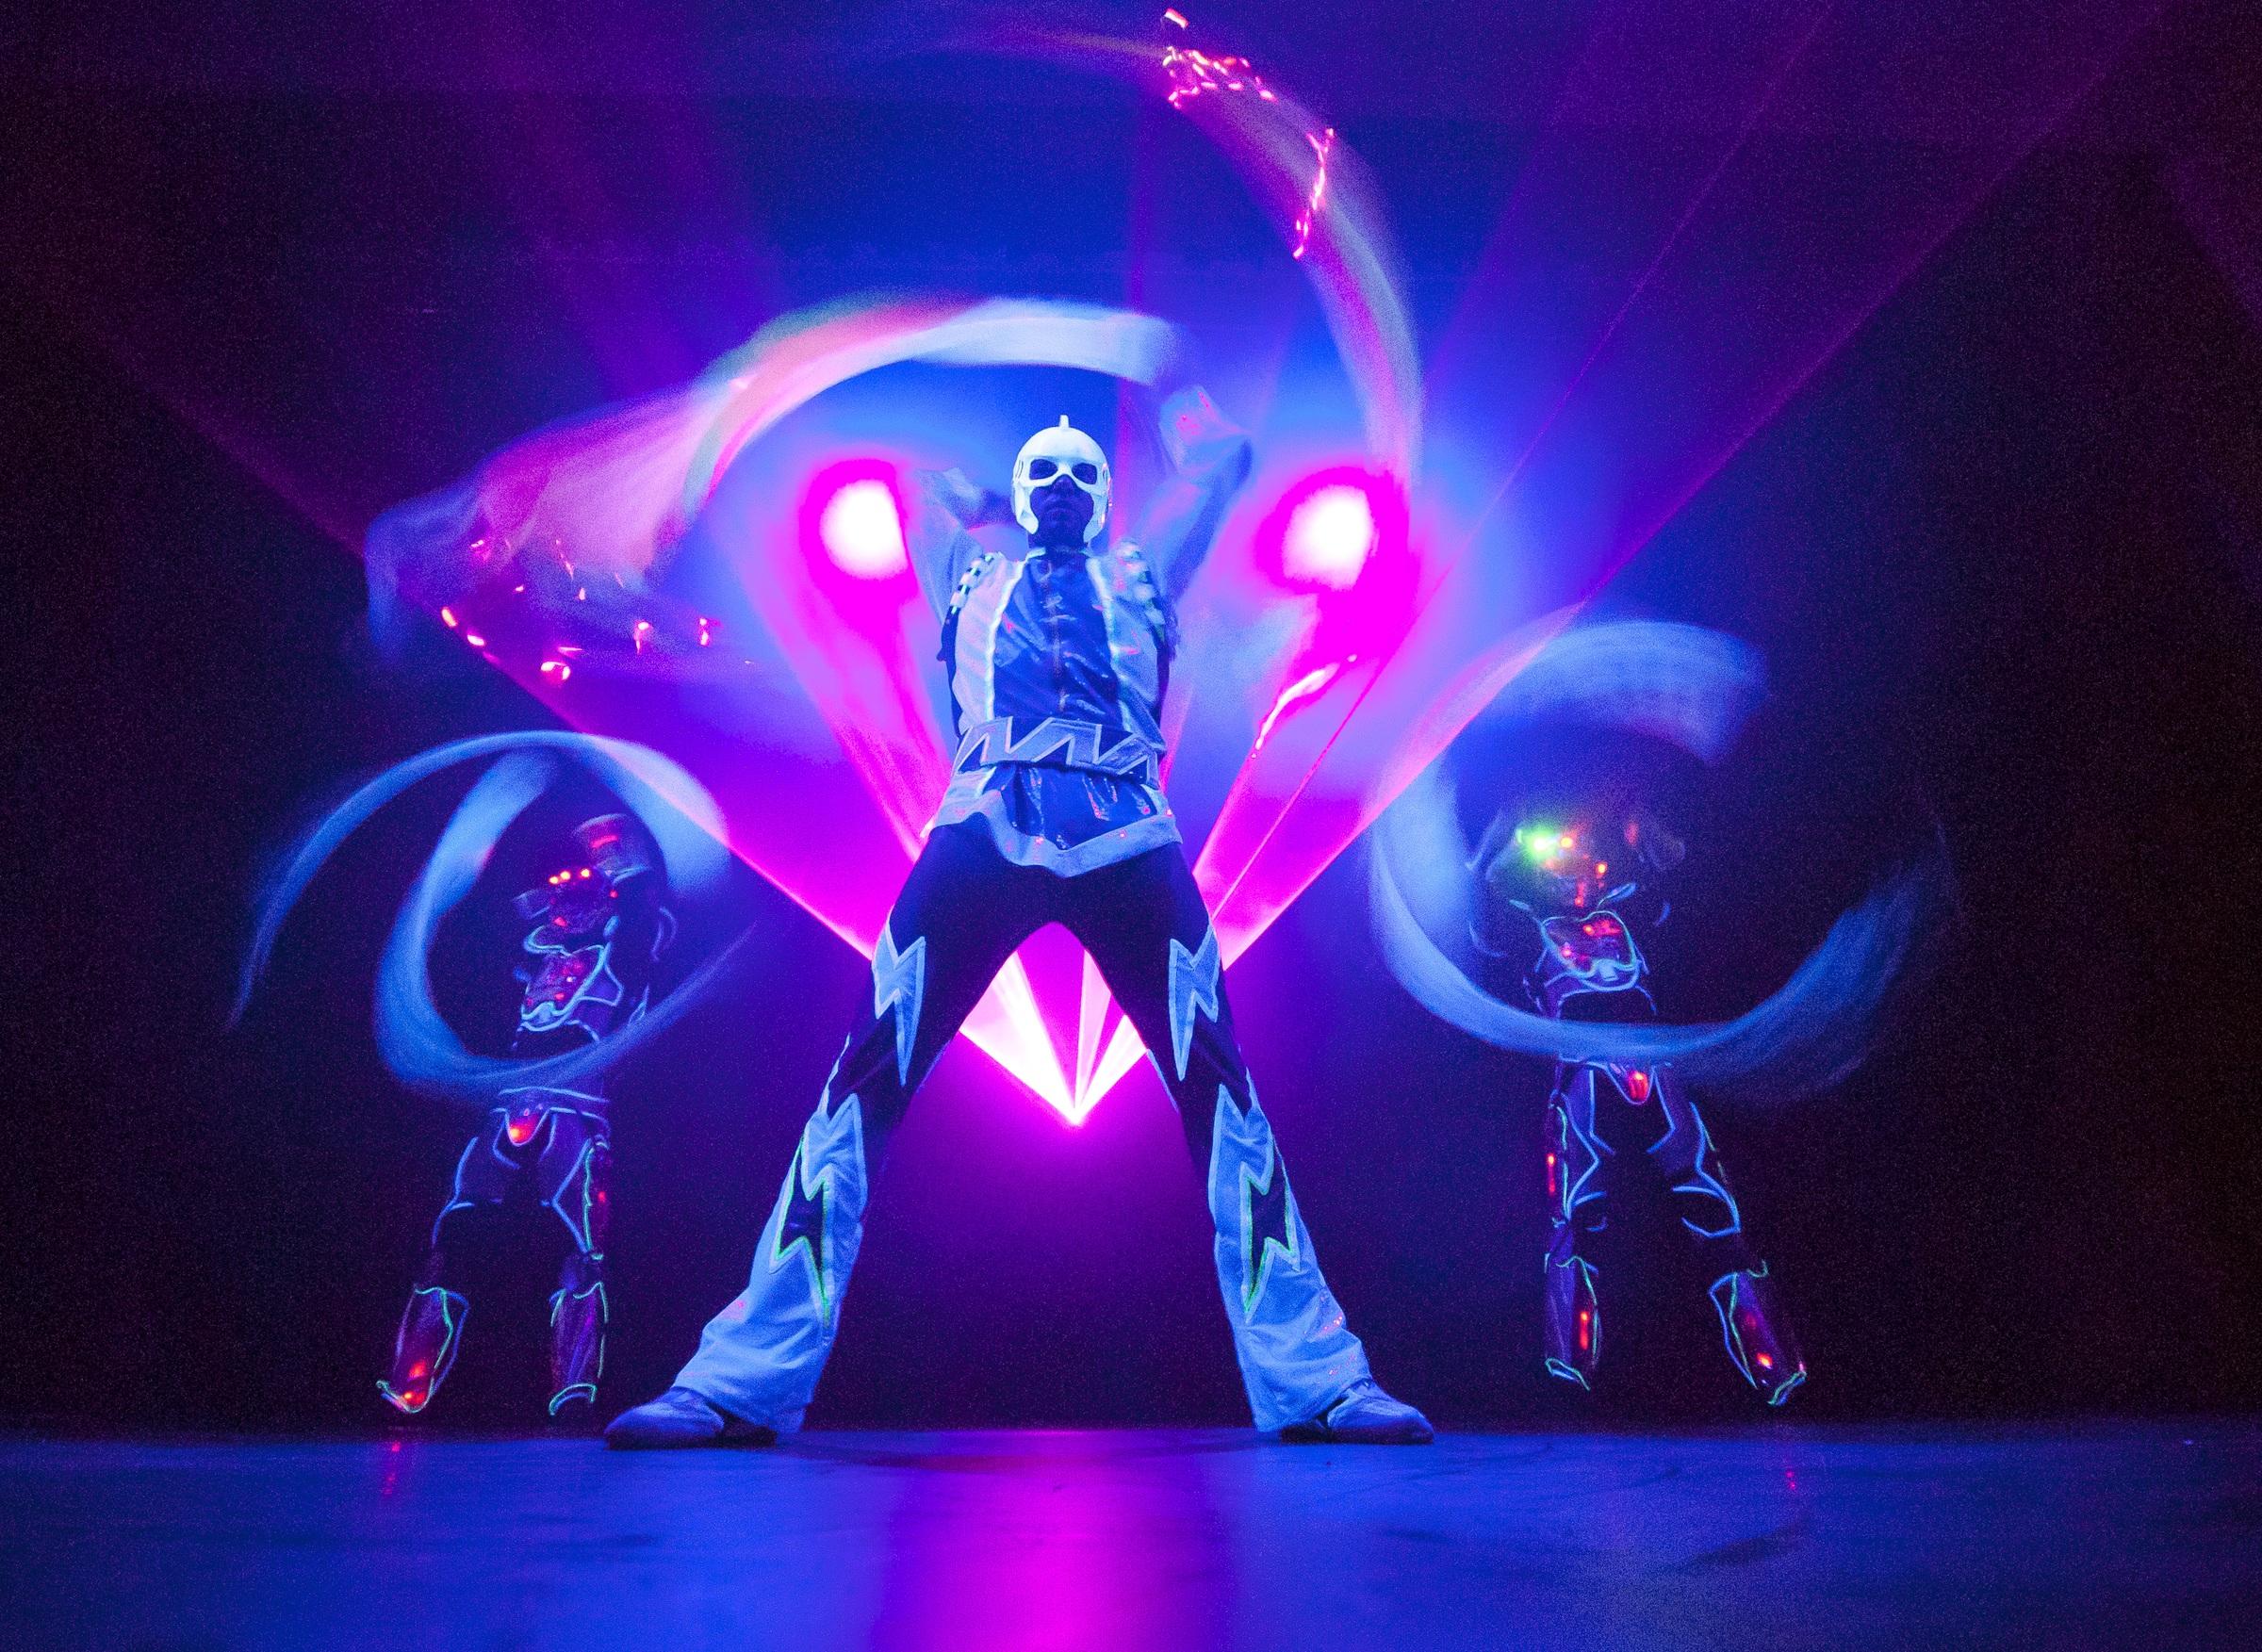 blacklight lights thailand travel lighting run glow skechers lifestyle black party